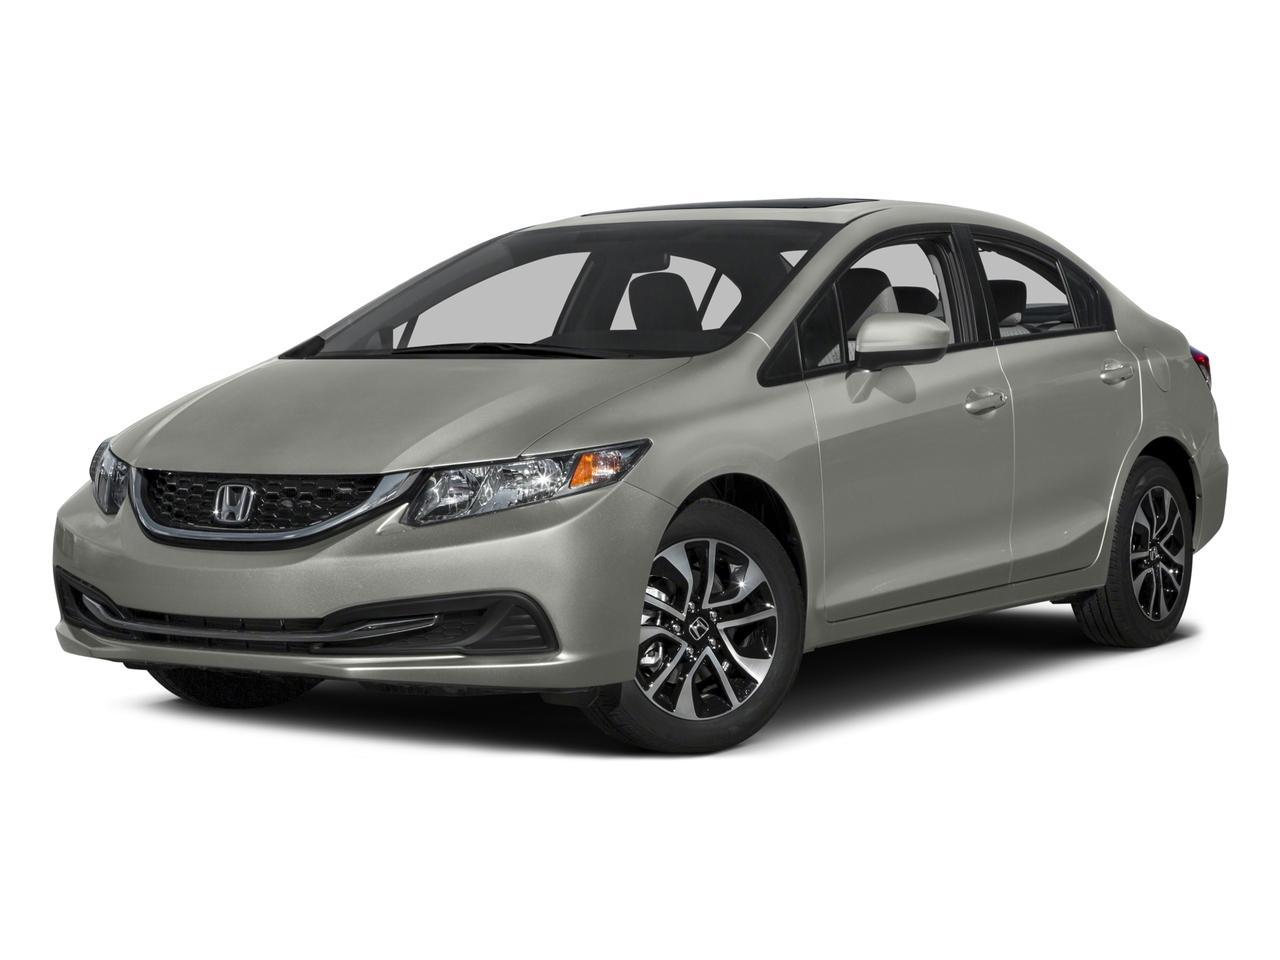 2015 Honda Civic Sedan Vehicle Photo in Laurel , MD 20724